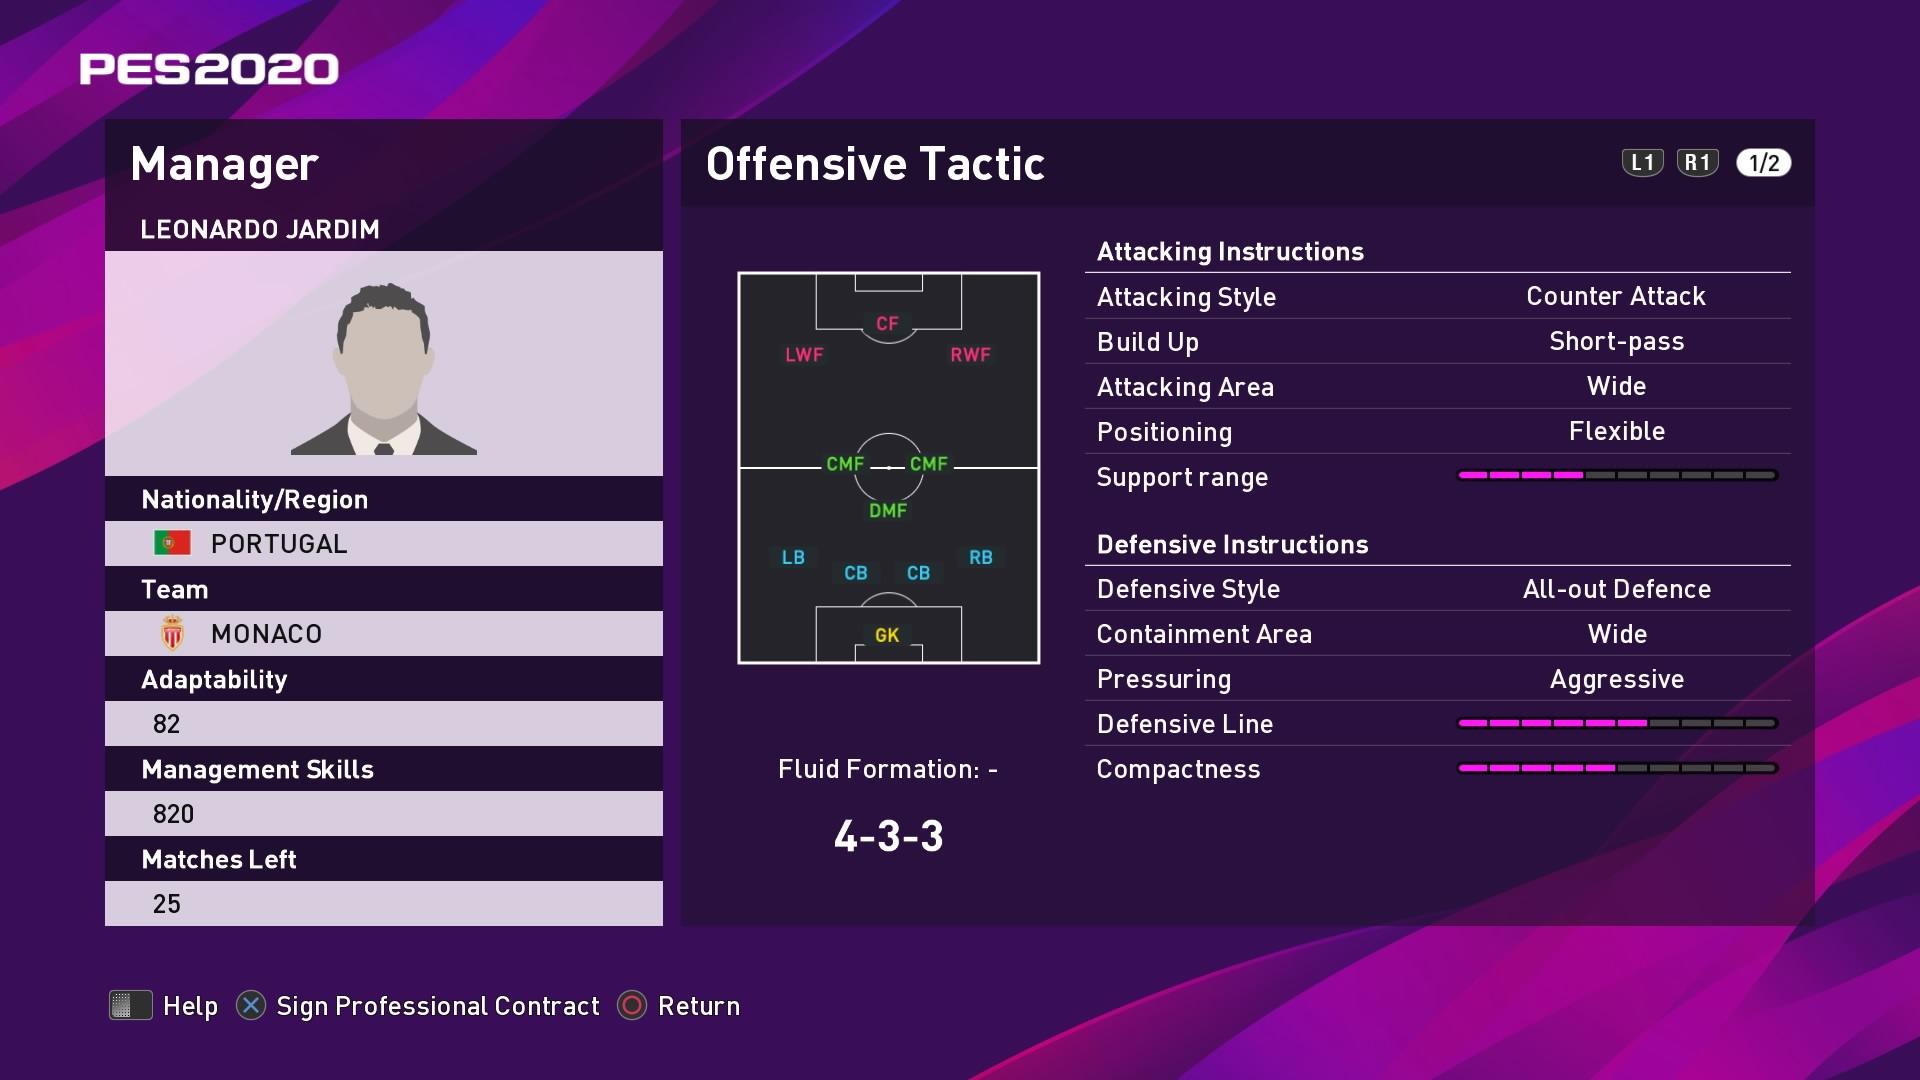 Leonardo Jardim Offensive Tactic in PES 2020 myClub